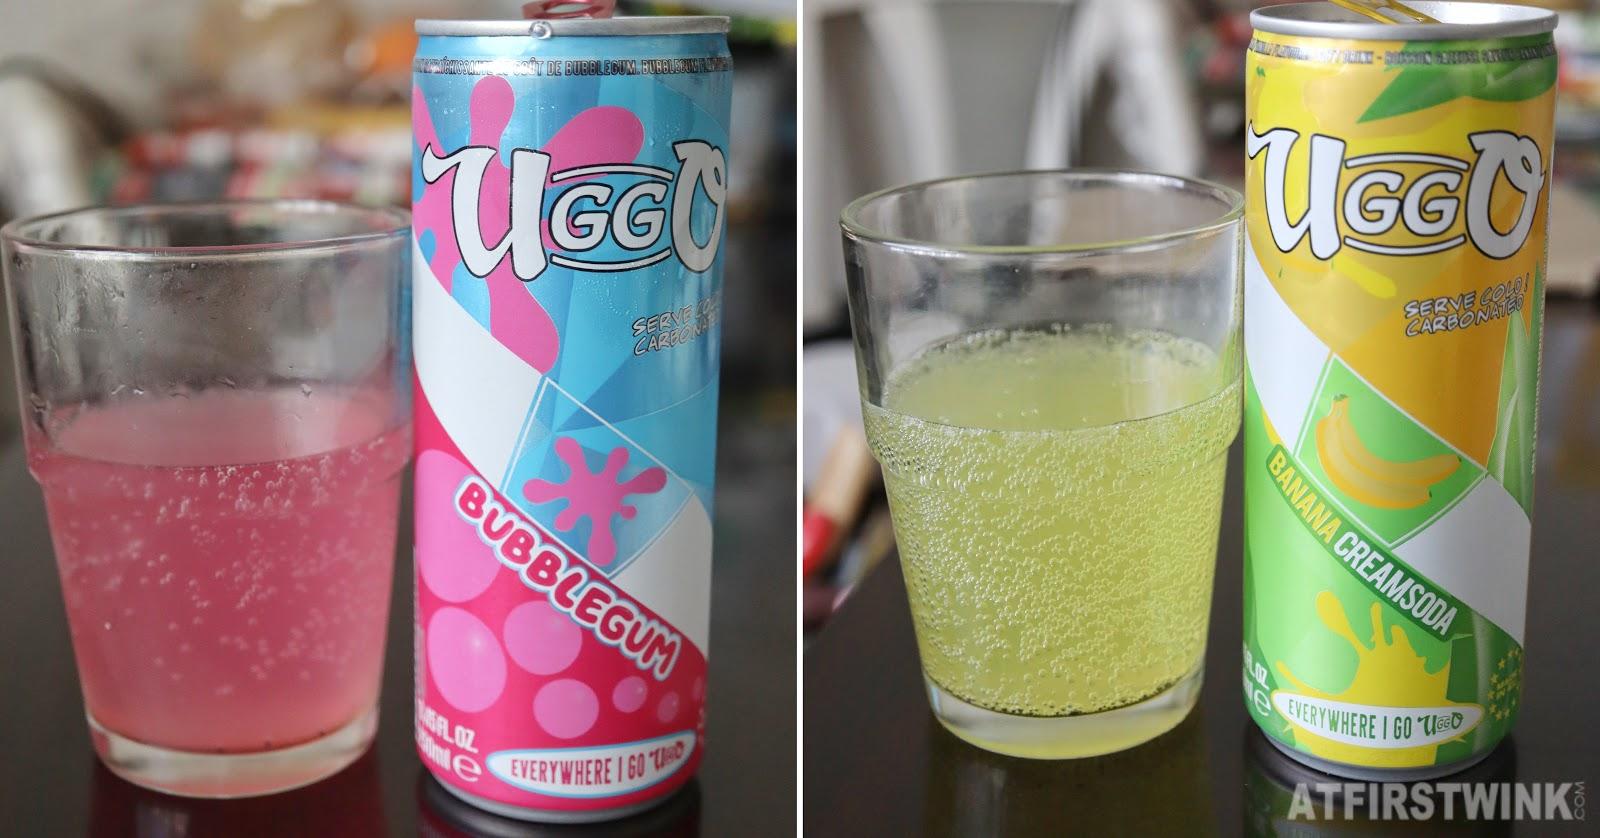 Uggo bubblegum soda banana cream drinks can